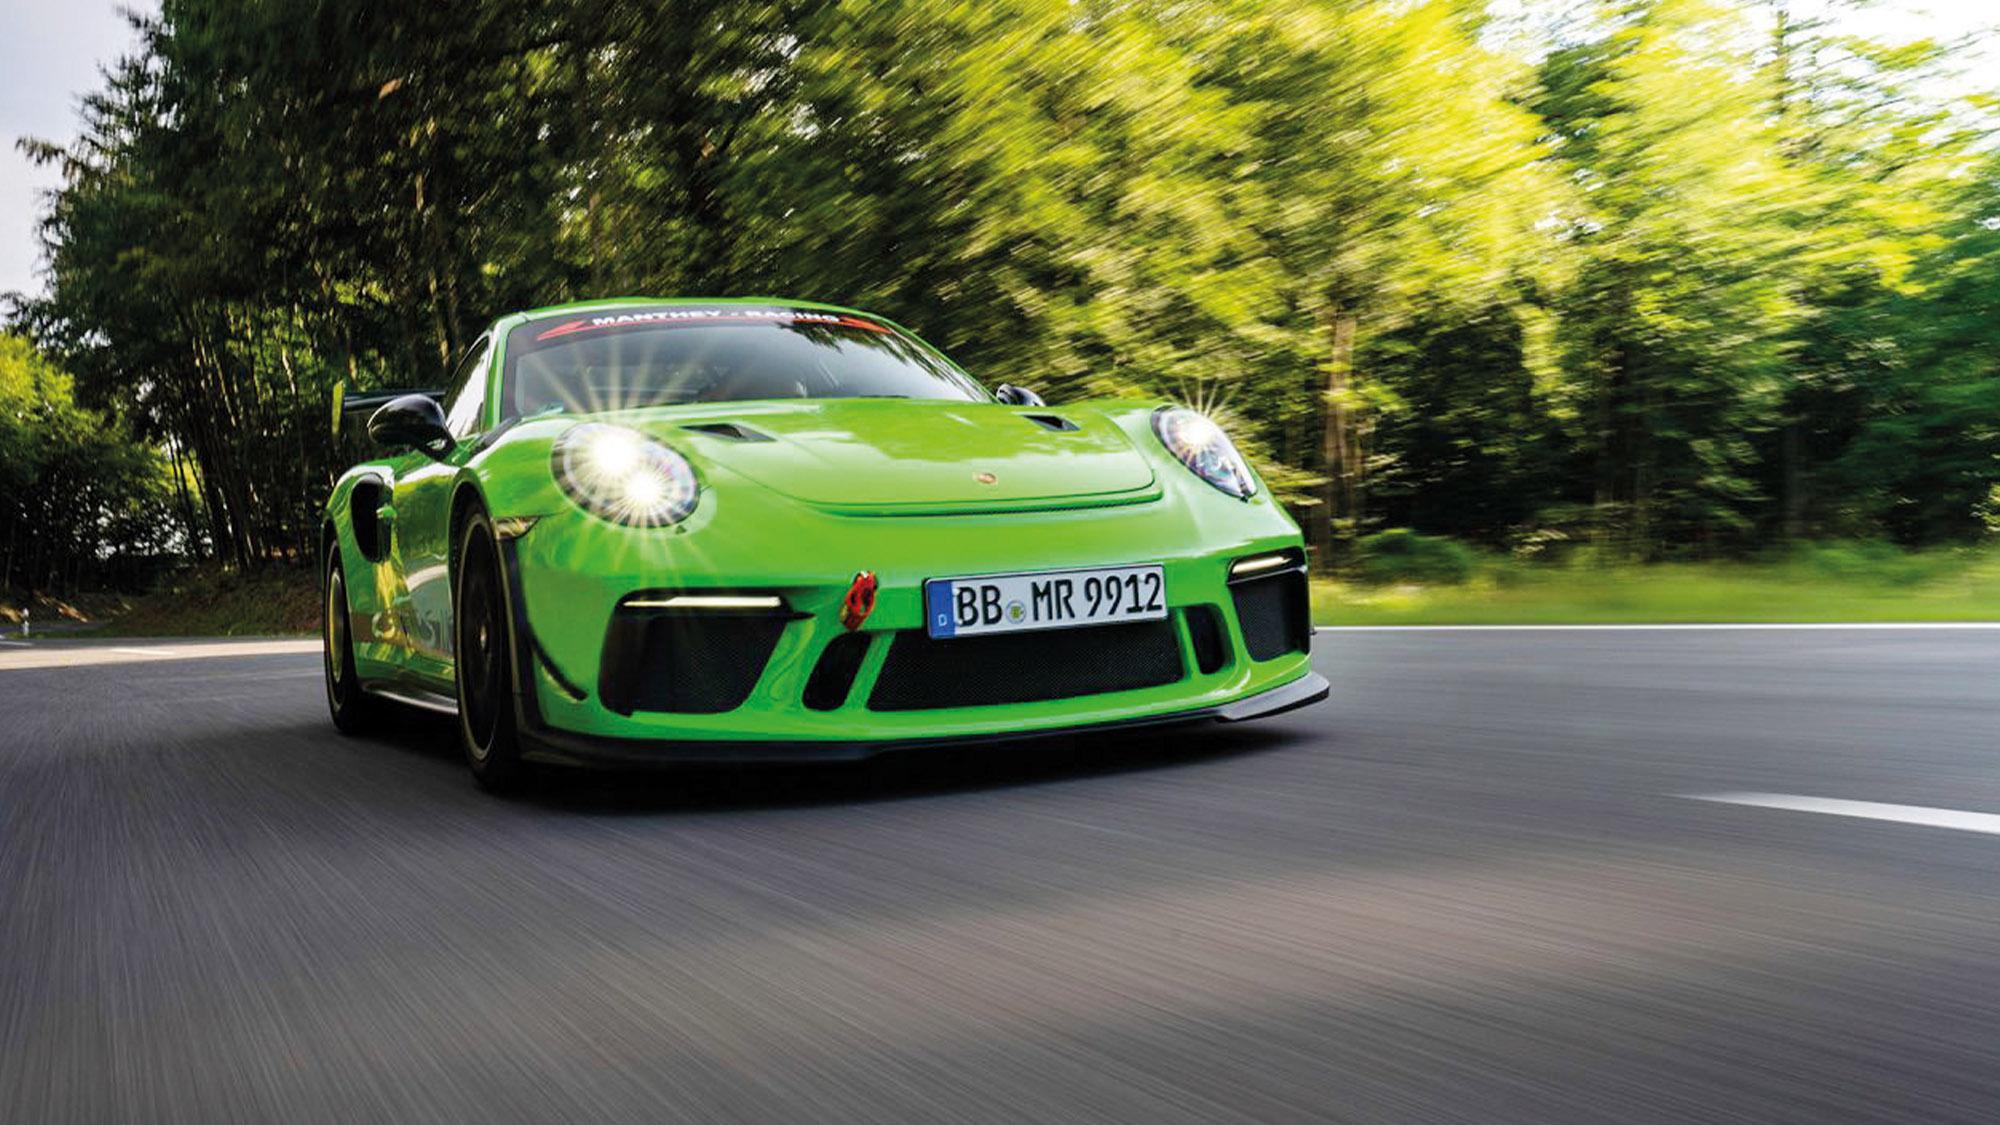 2020 Porsche 911 GT3 RS MR